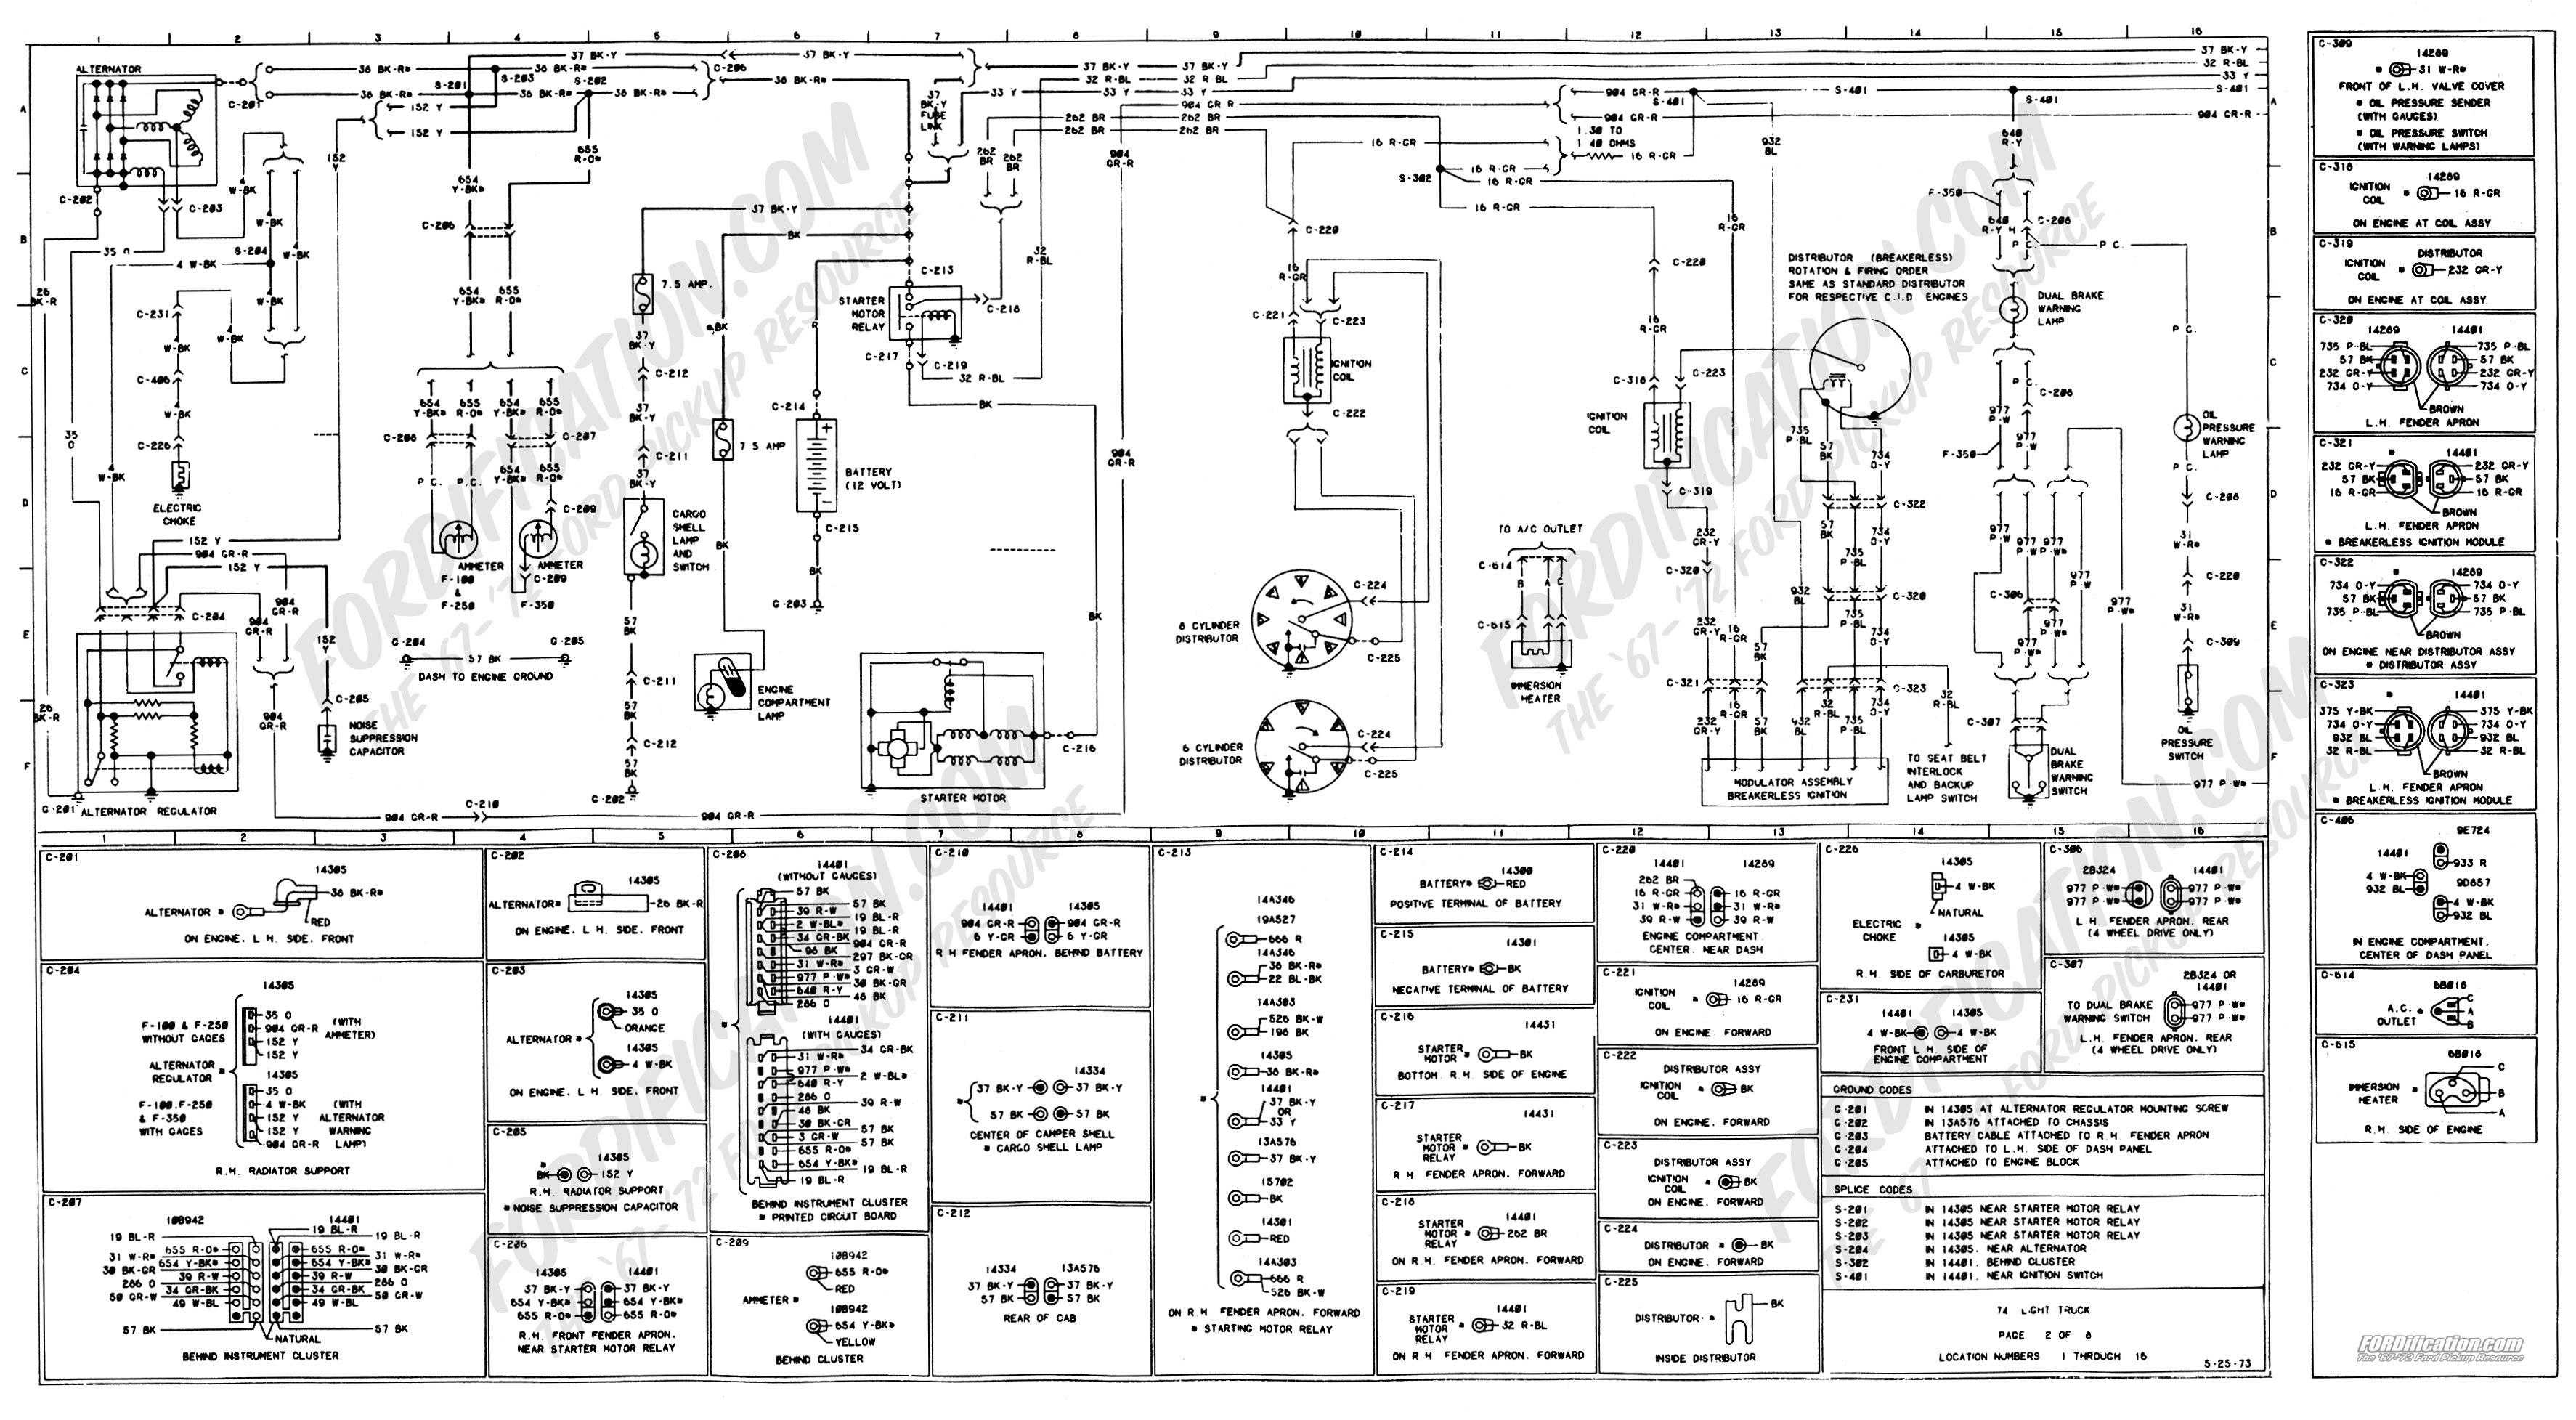 800 Series Ford Tractor Wiring Diagram Auto Electrical Suzuki Maverick 1973